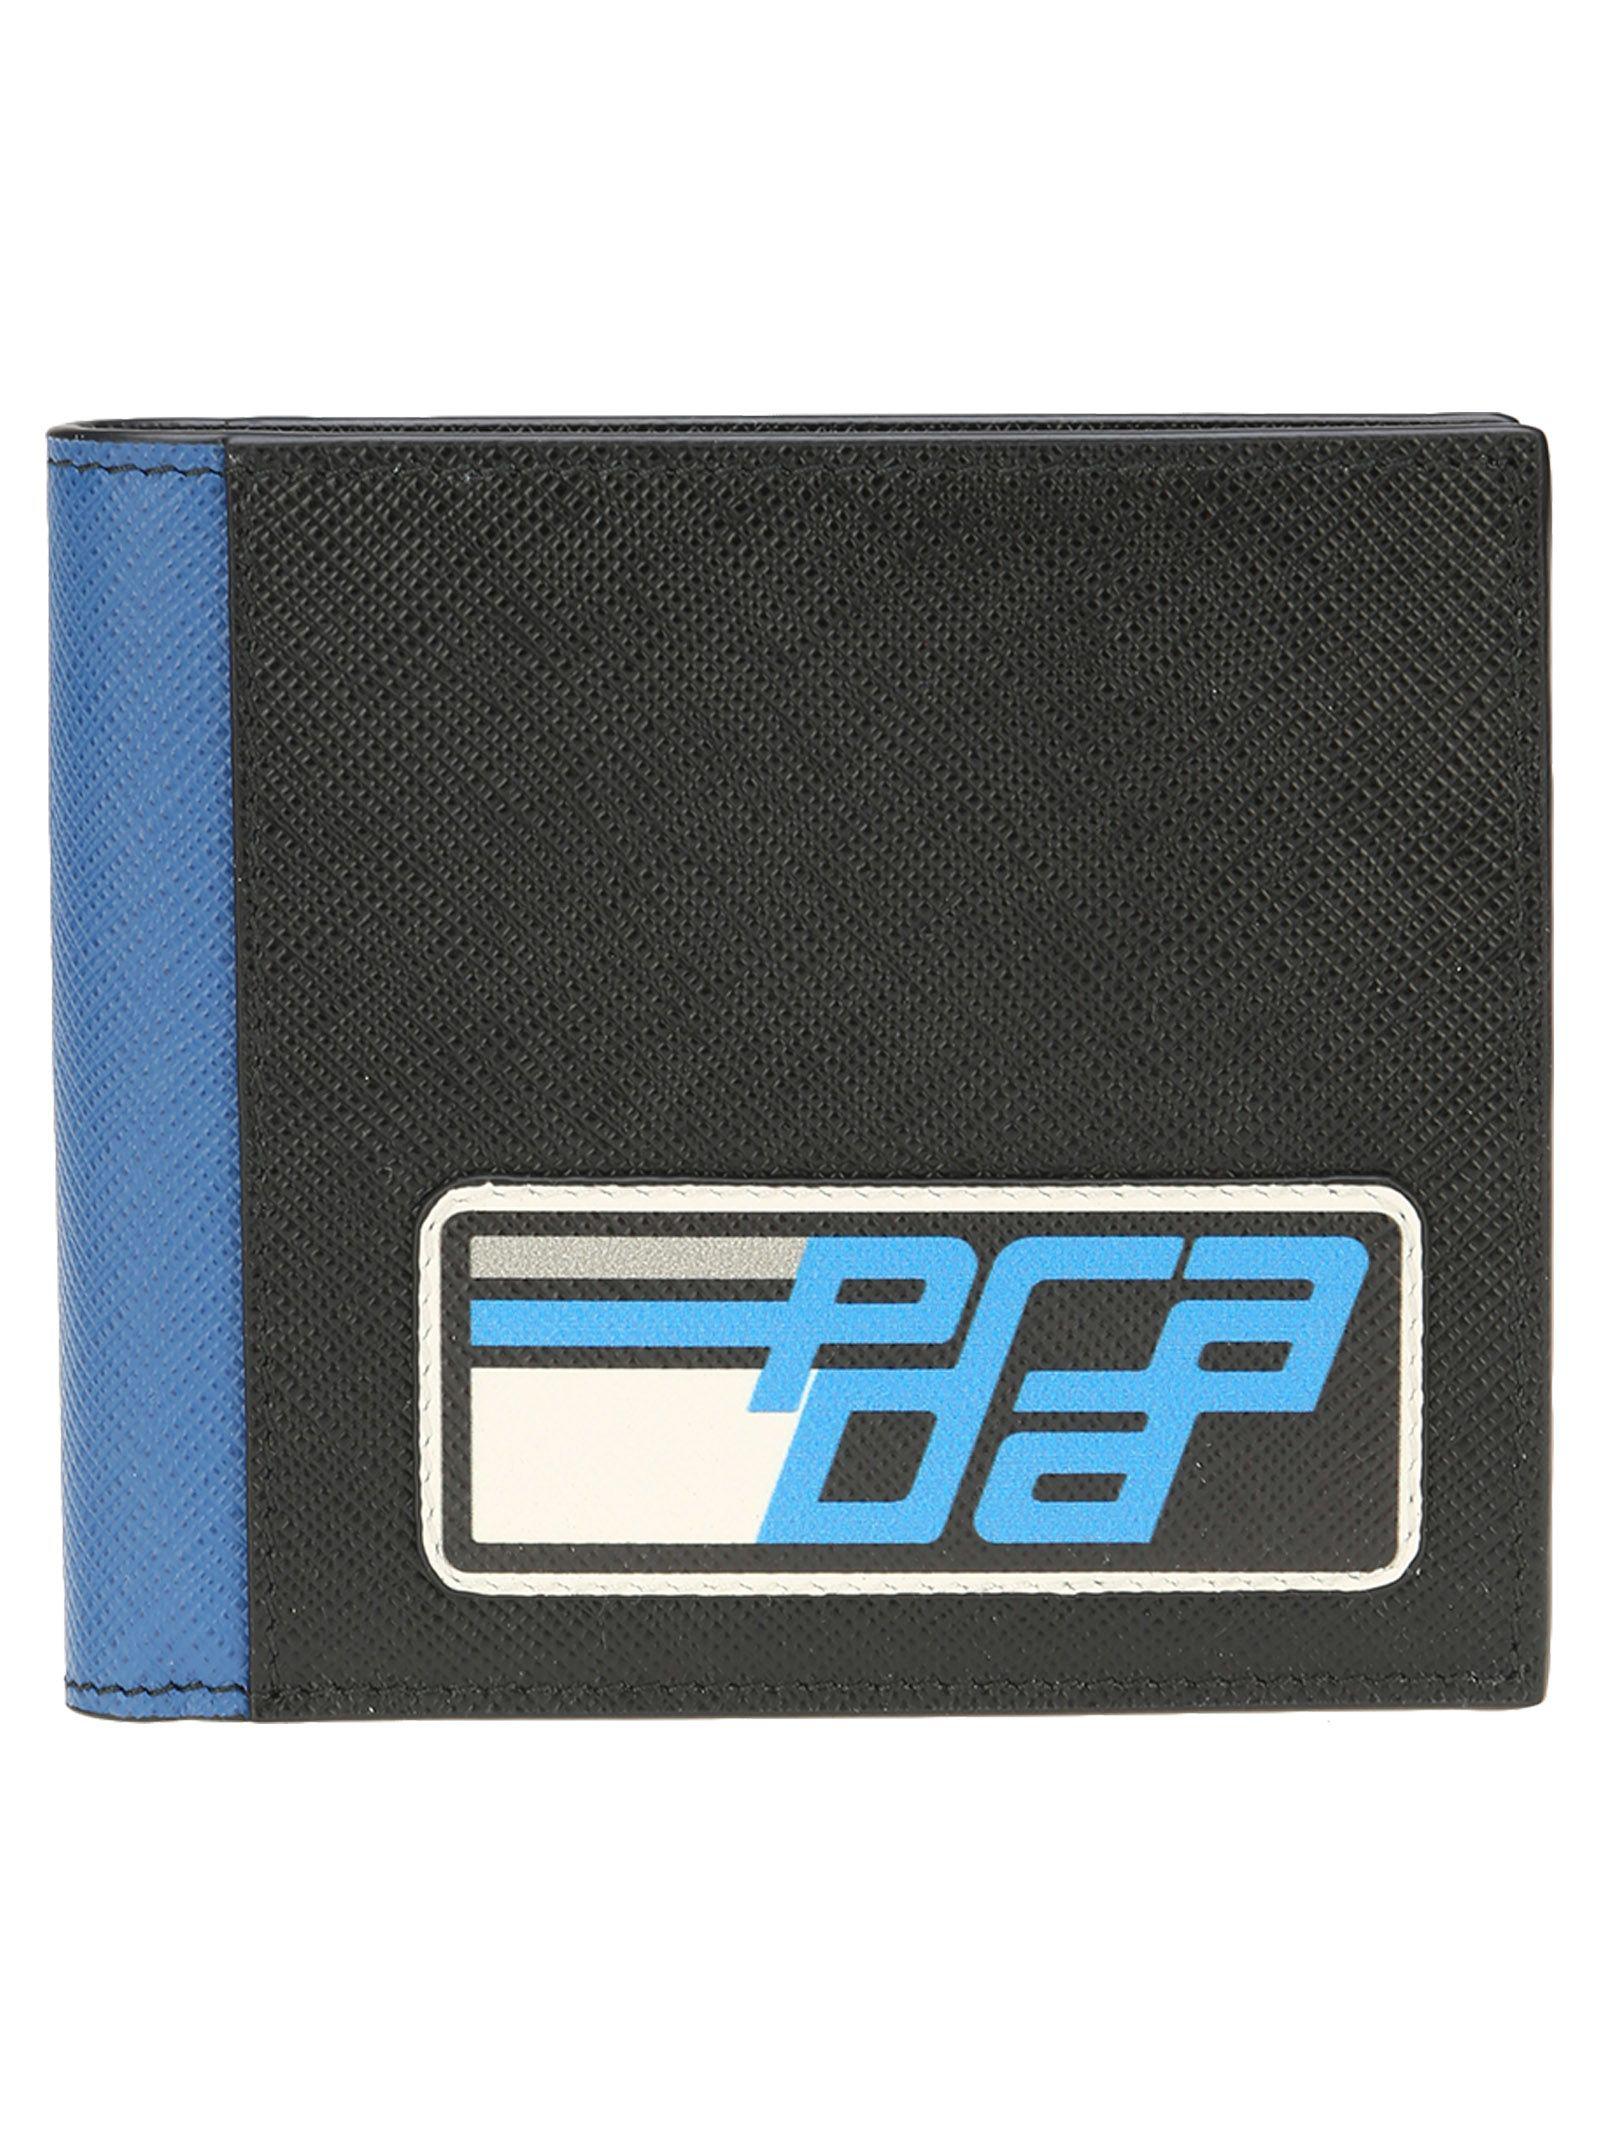 5e25974ab08c Prada Saffiano Leather Classic Wallet In Black | ModeSens